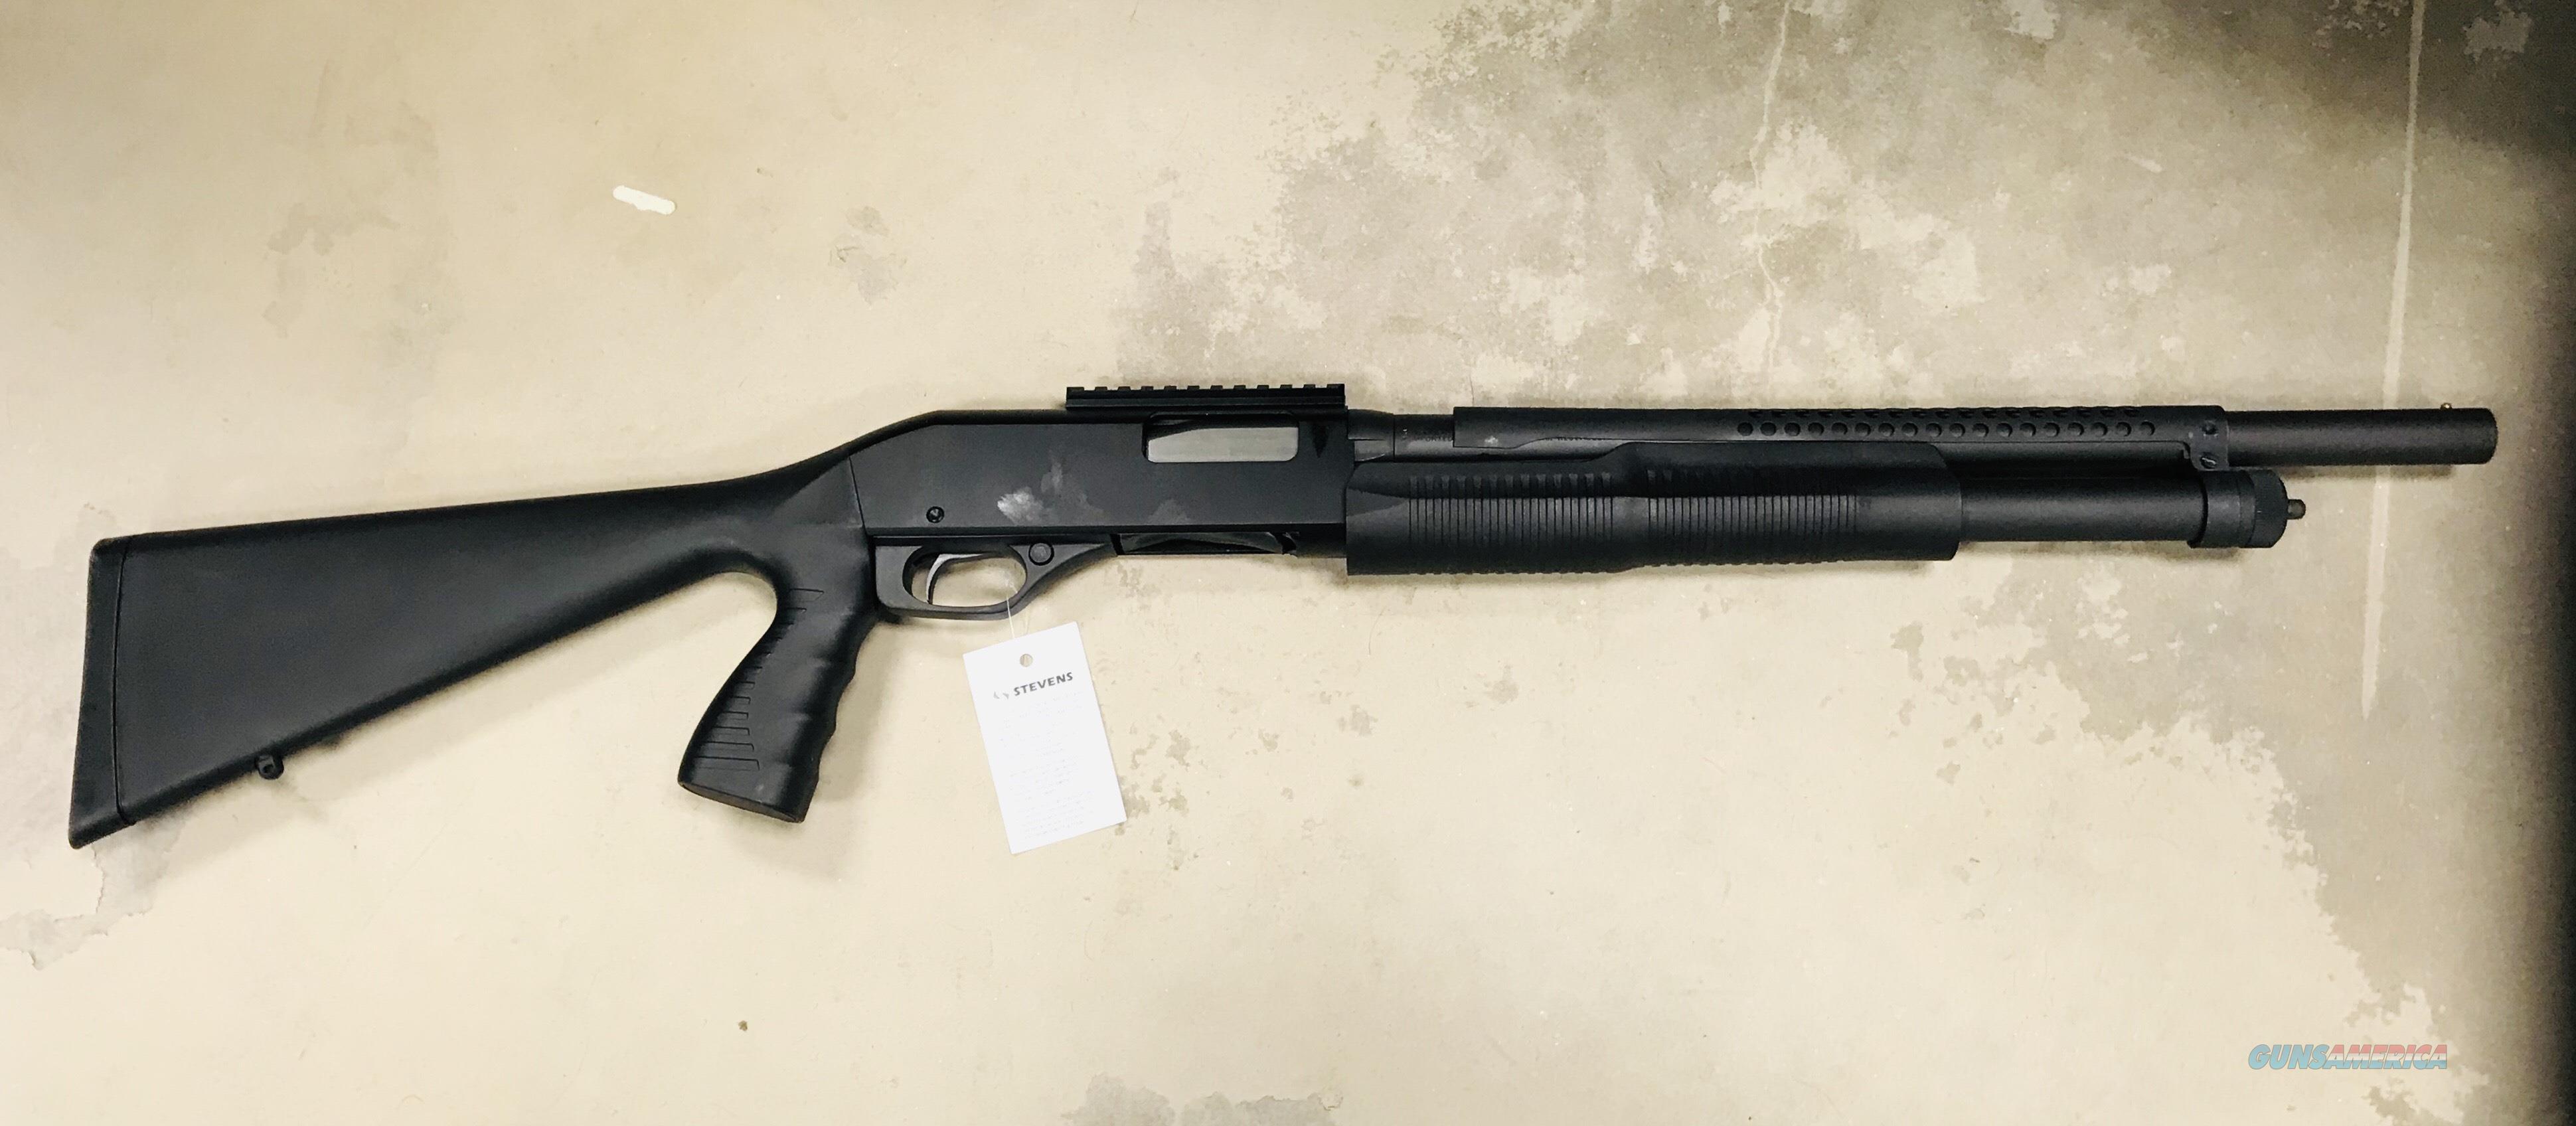 "SAVAGE STEVENS 320 12GA 18"" HEAT SHIELD      FREE SHIPPING  Guns > Shotguns > Stevens Shotguns"